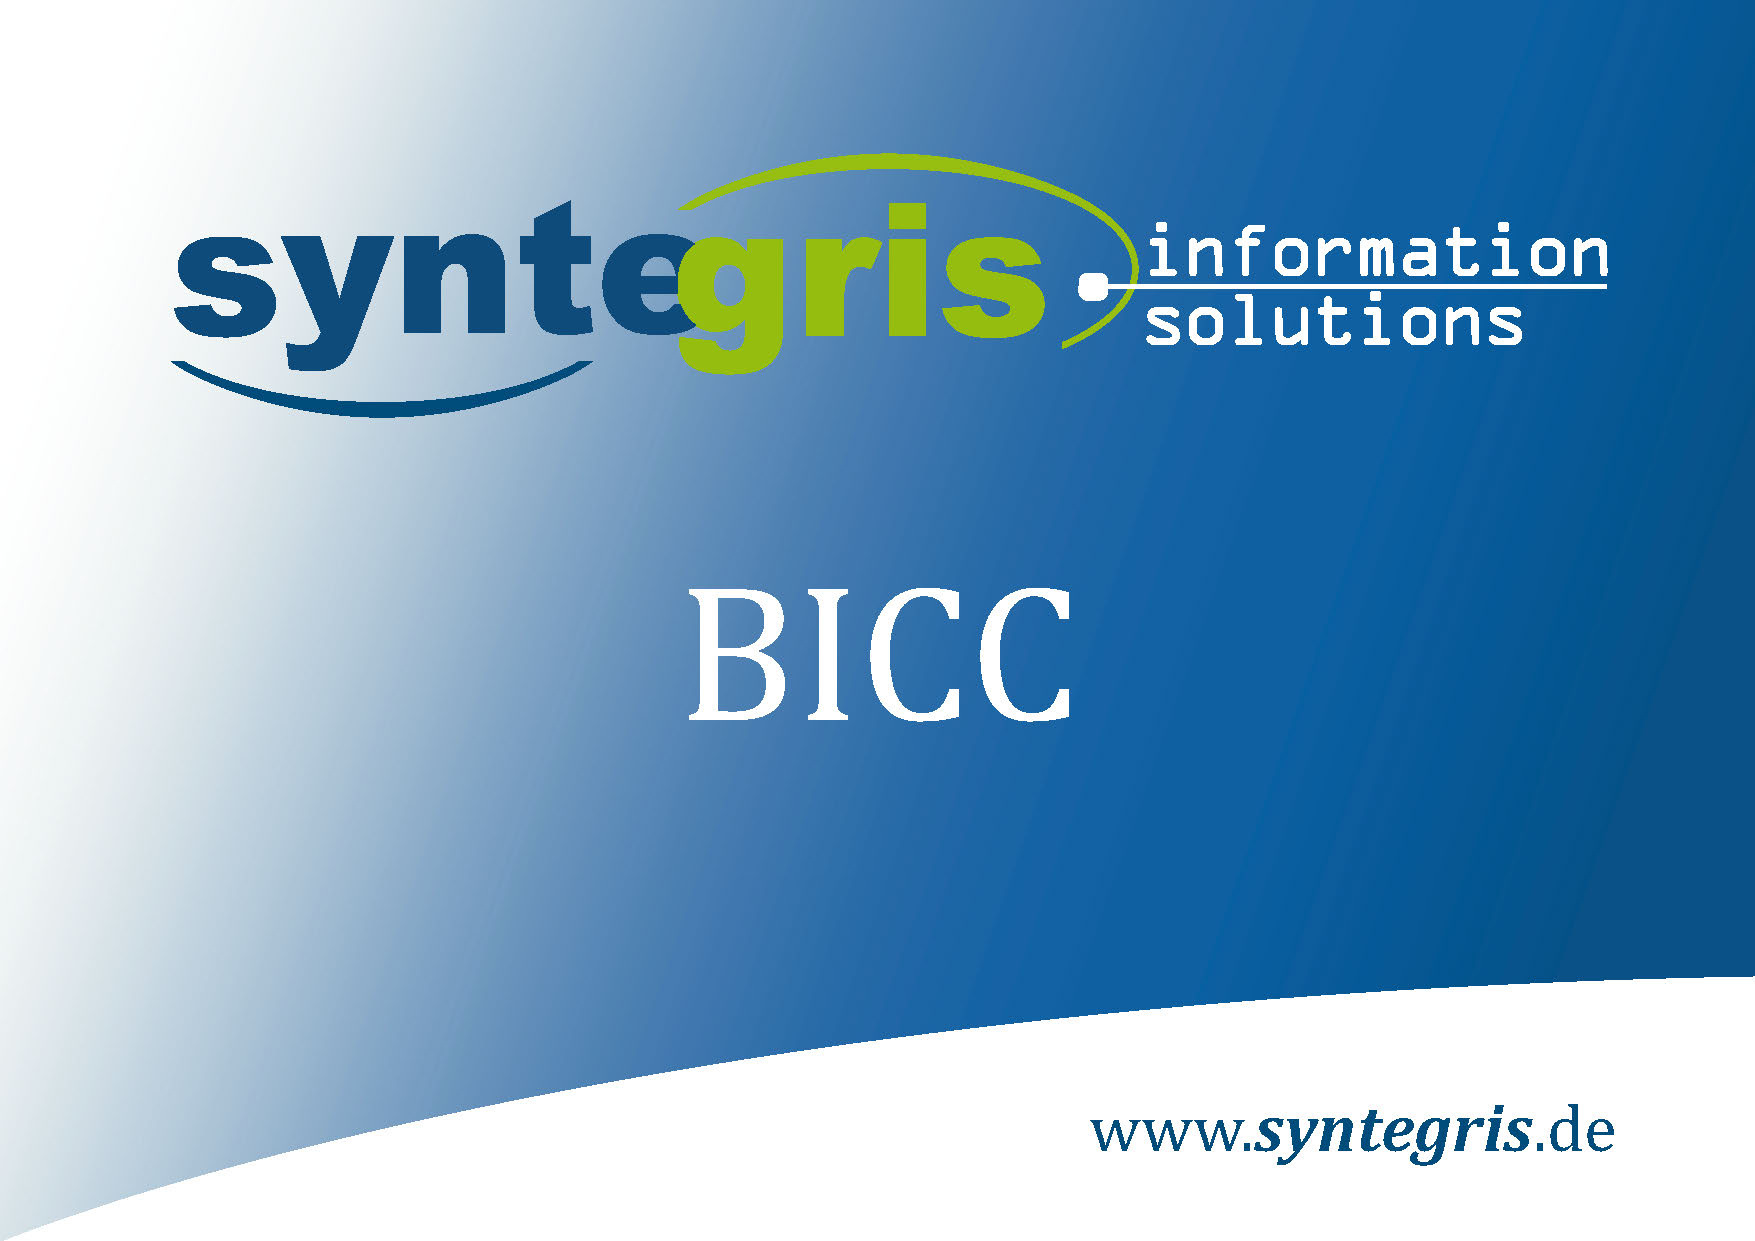 Syntegris BICC